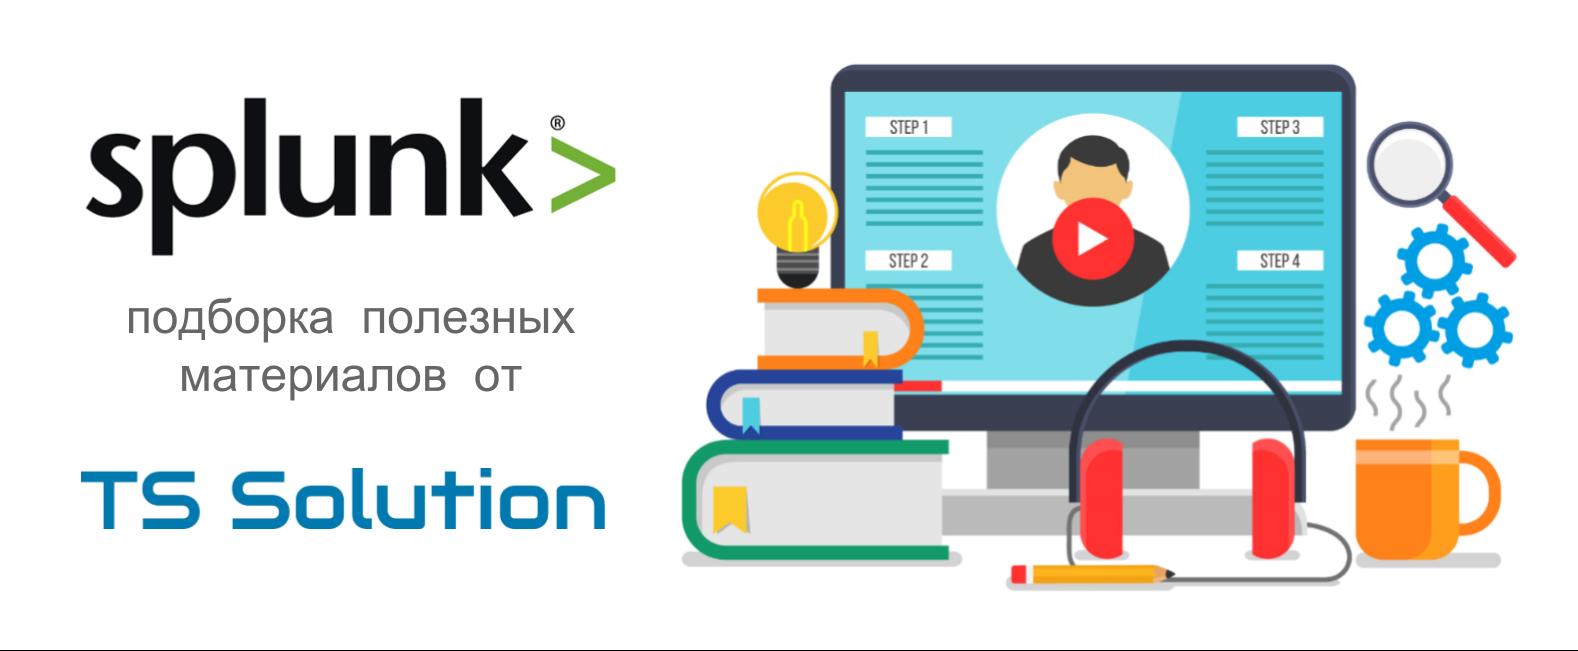 Splunk How-to, или Как и где научиться Splunk - 7